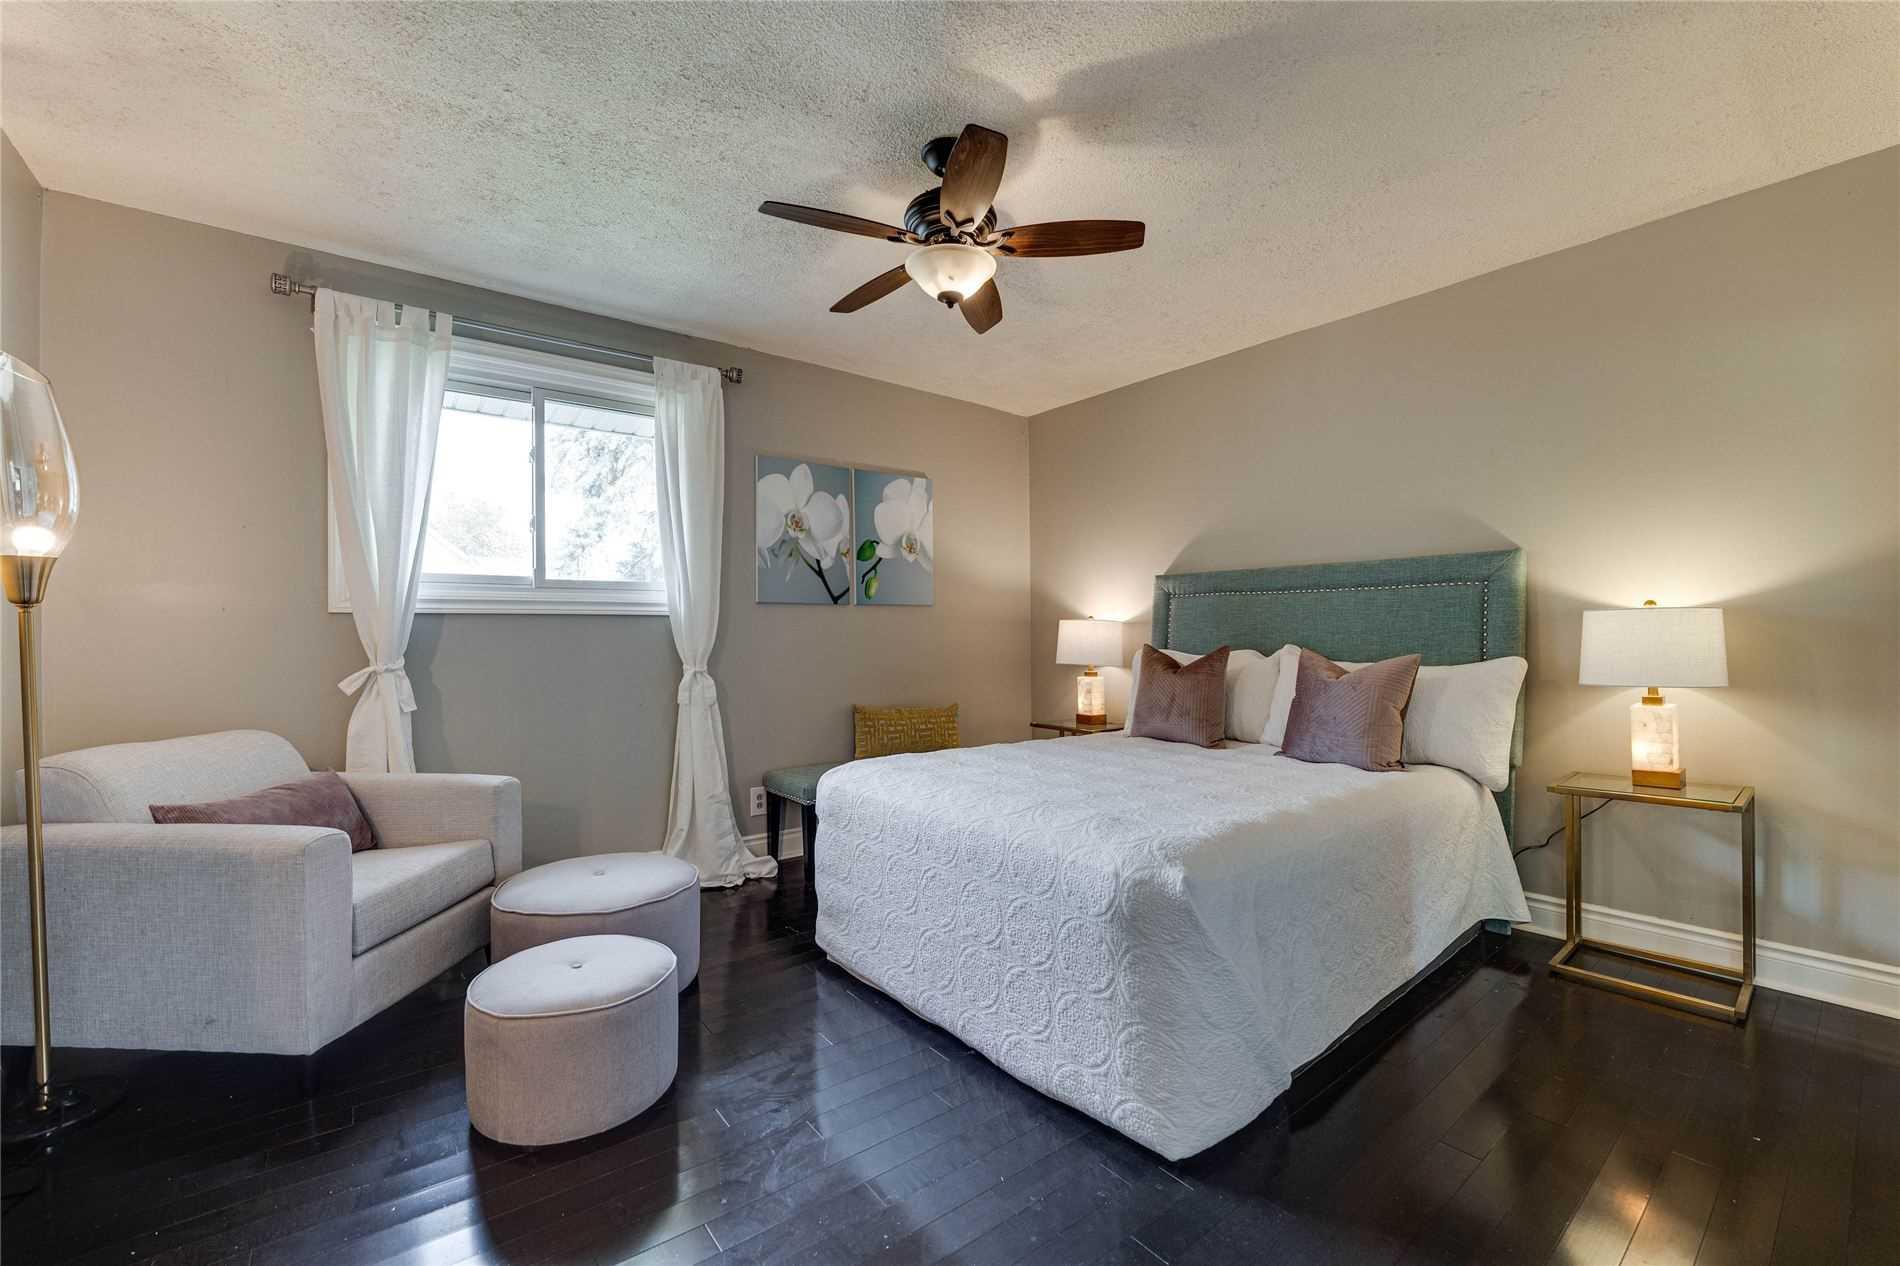 Detached house For Sale In Innisfil - 26 Queen St, Innisfil, Ontario, Canada L0L1L0 , 3 Bedrooms Bedrooms, ,3 BathroomsBathrooms,Detached,For Sale,Queen